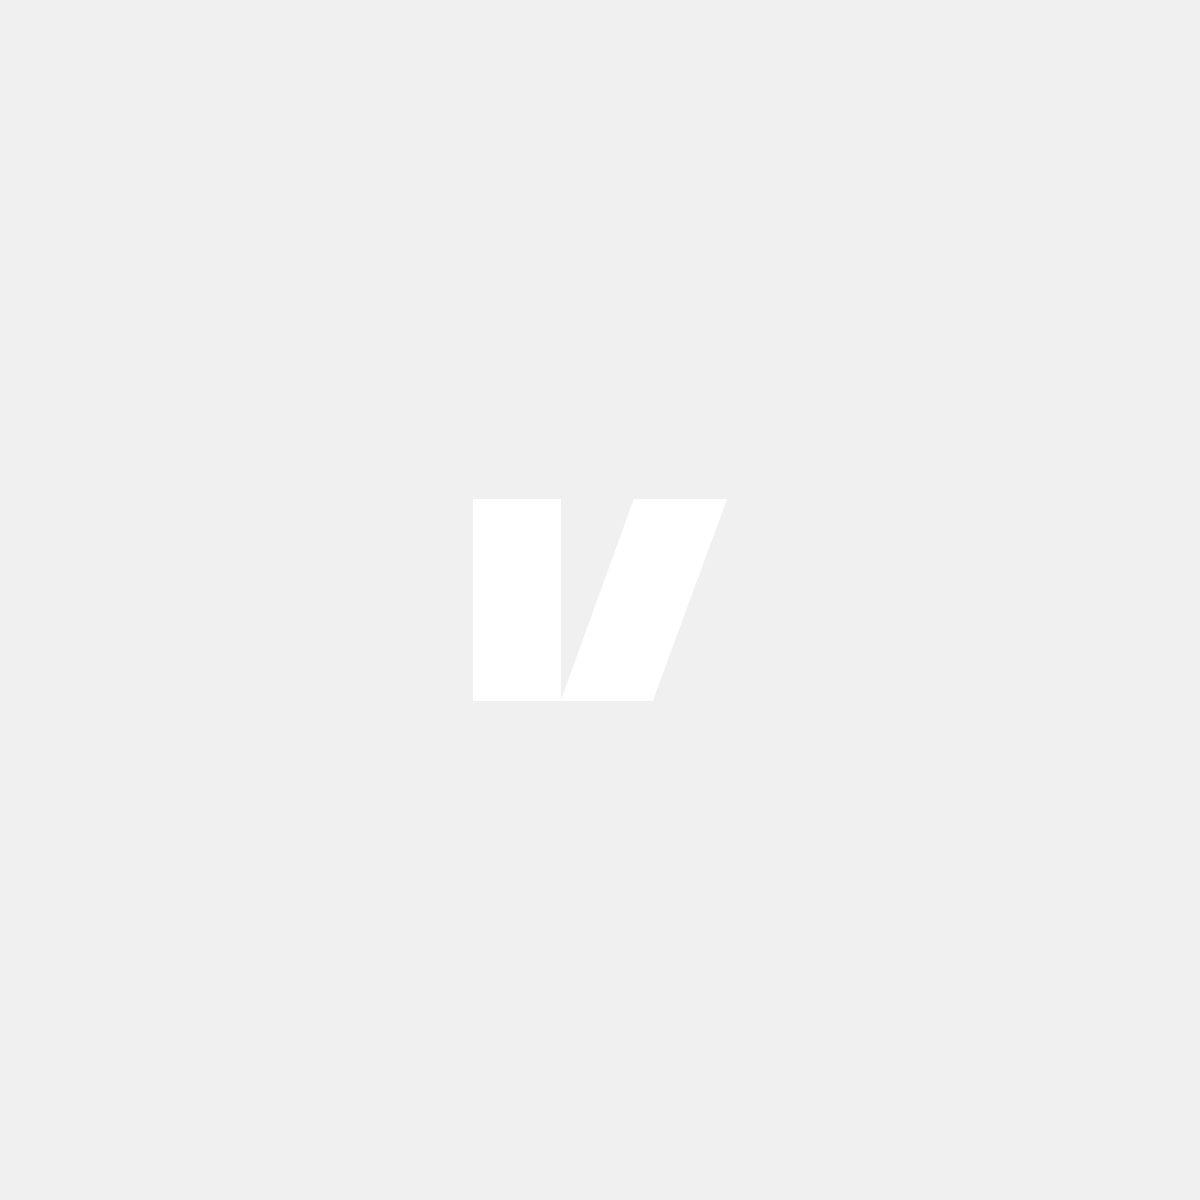 Bilstein B6 rear sport shock absorbers for the Volvo V40II